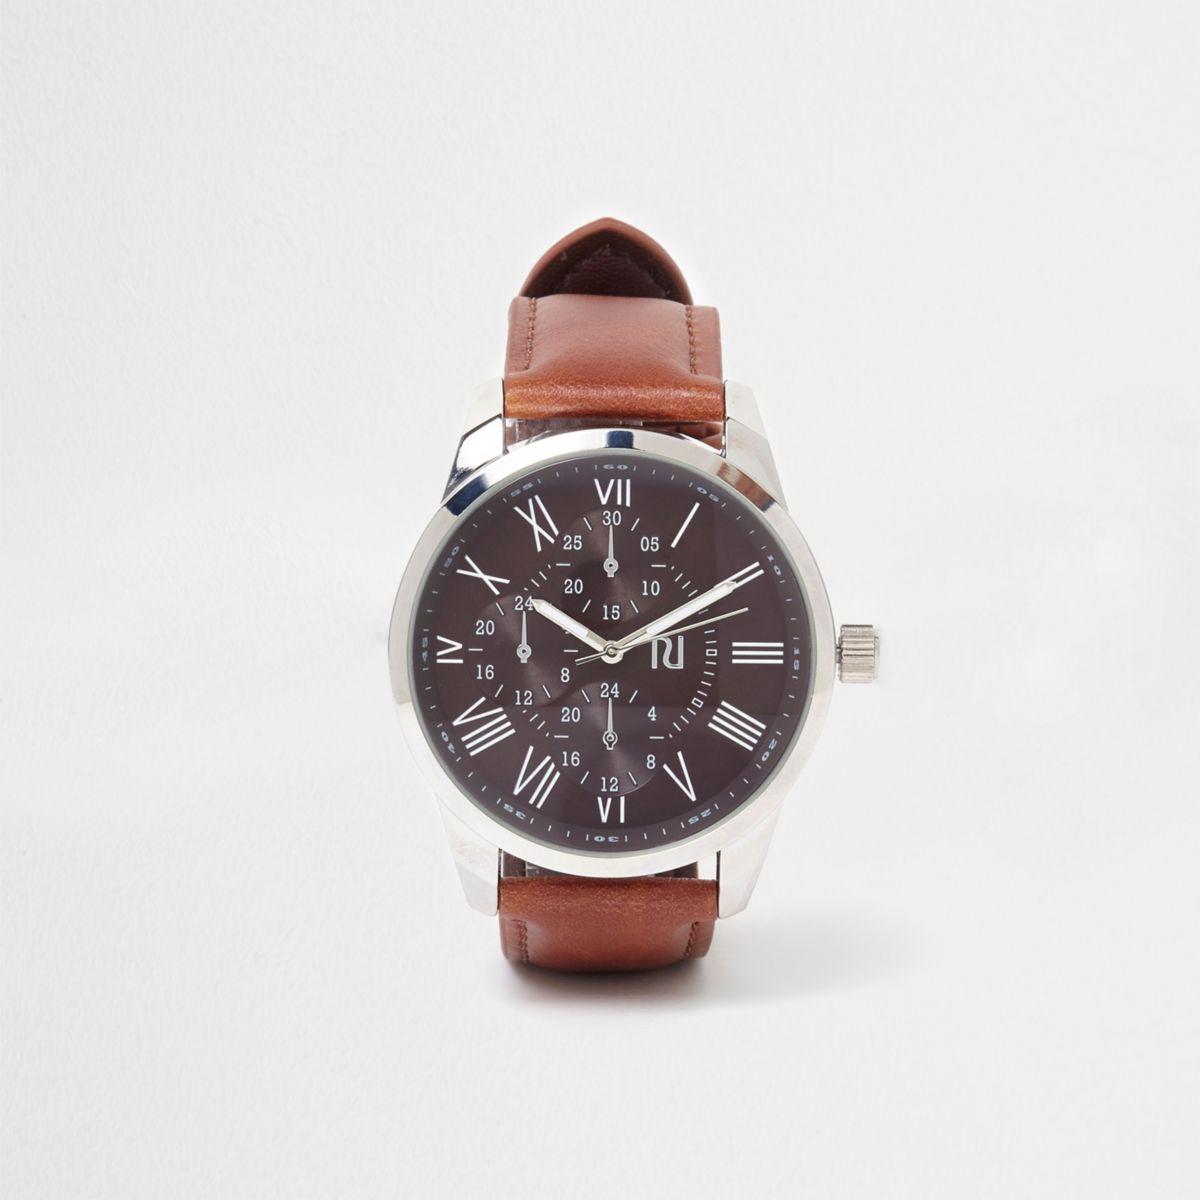 Braune, runde Armbanduhr im Leder-Look